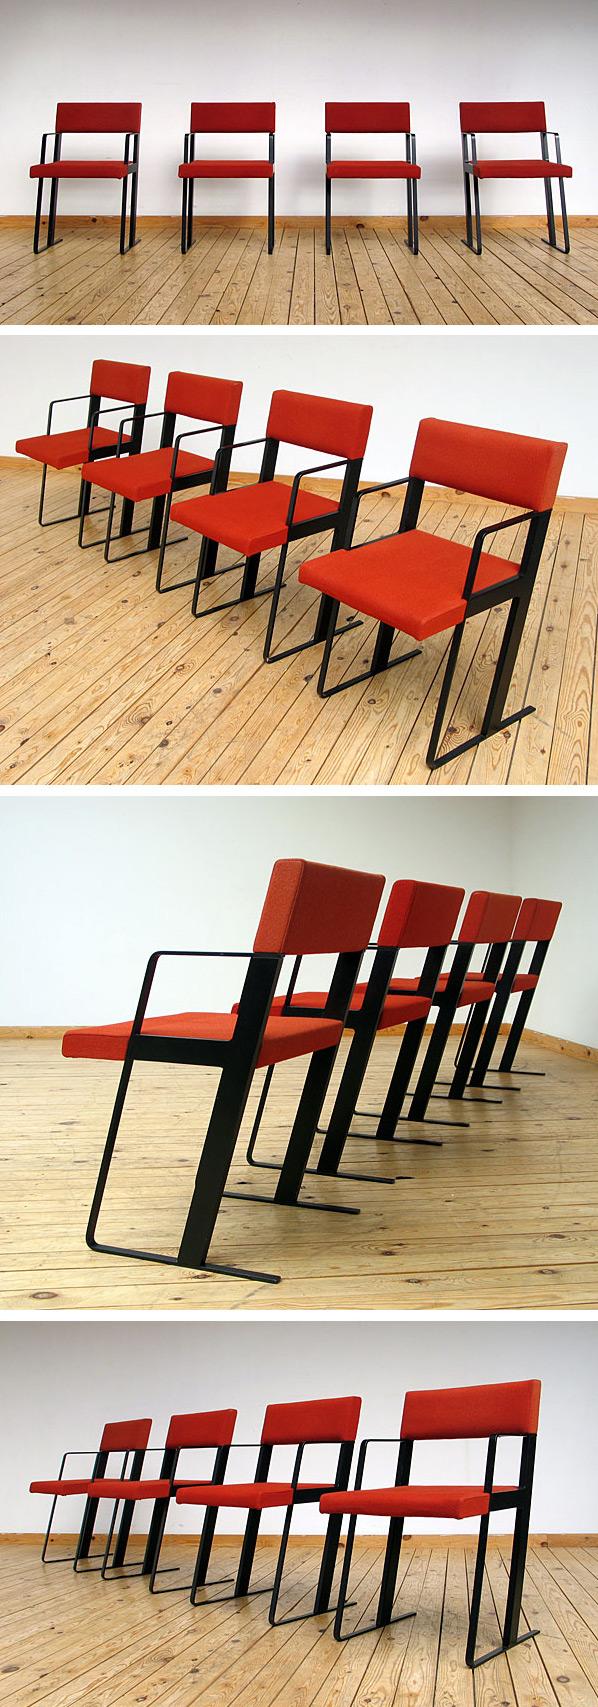 DC chairs Dick Spierenburg for Castelijn 1978 Large